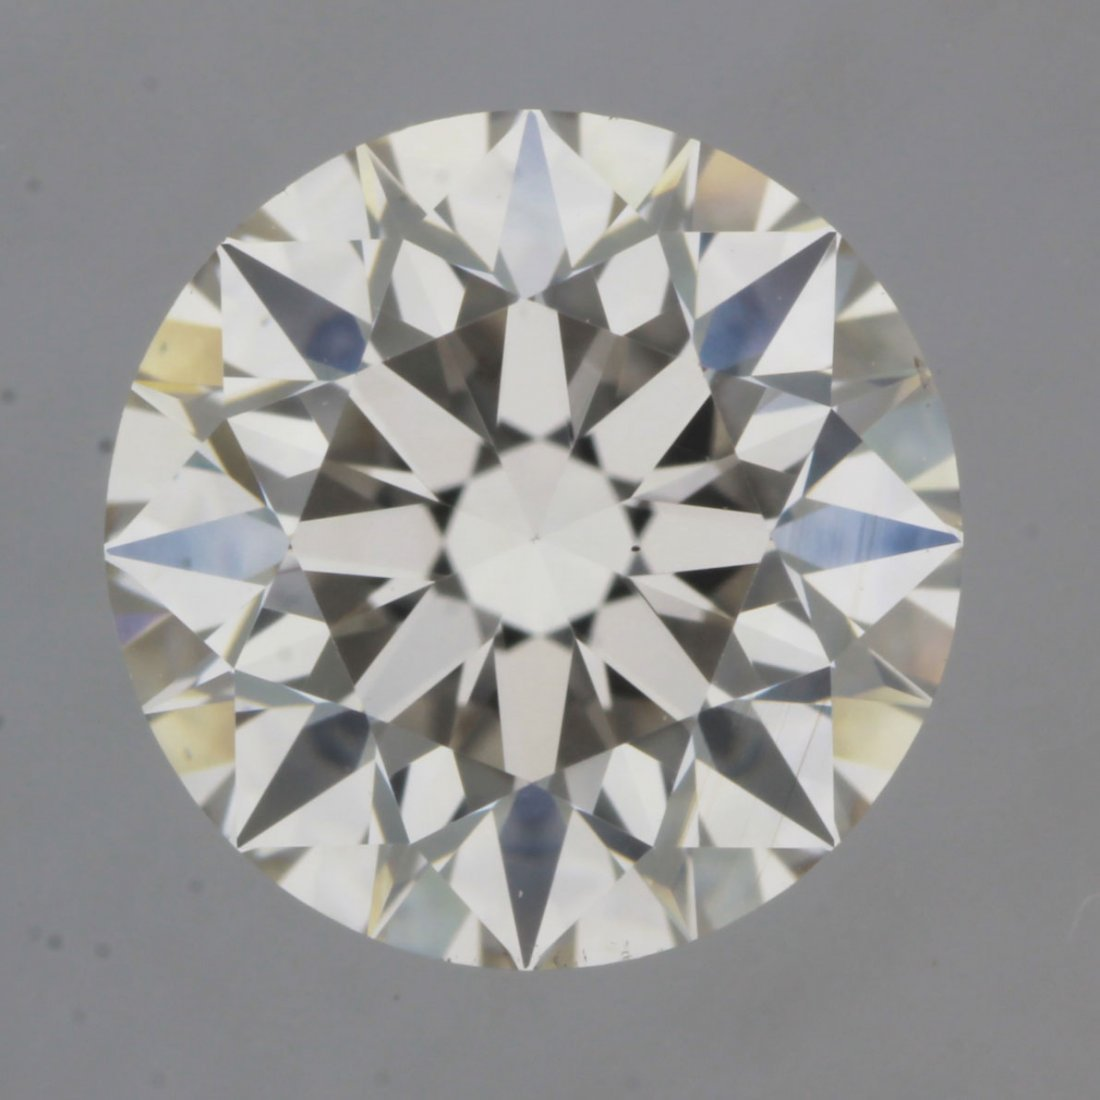 1.00carat J/VS1 Round Cut Diamond (GIA Certified)